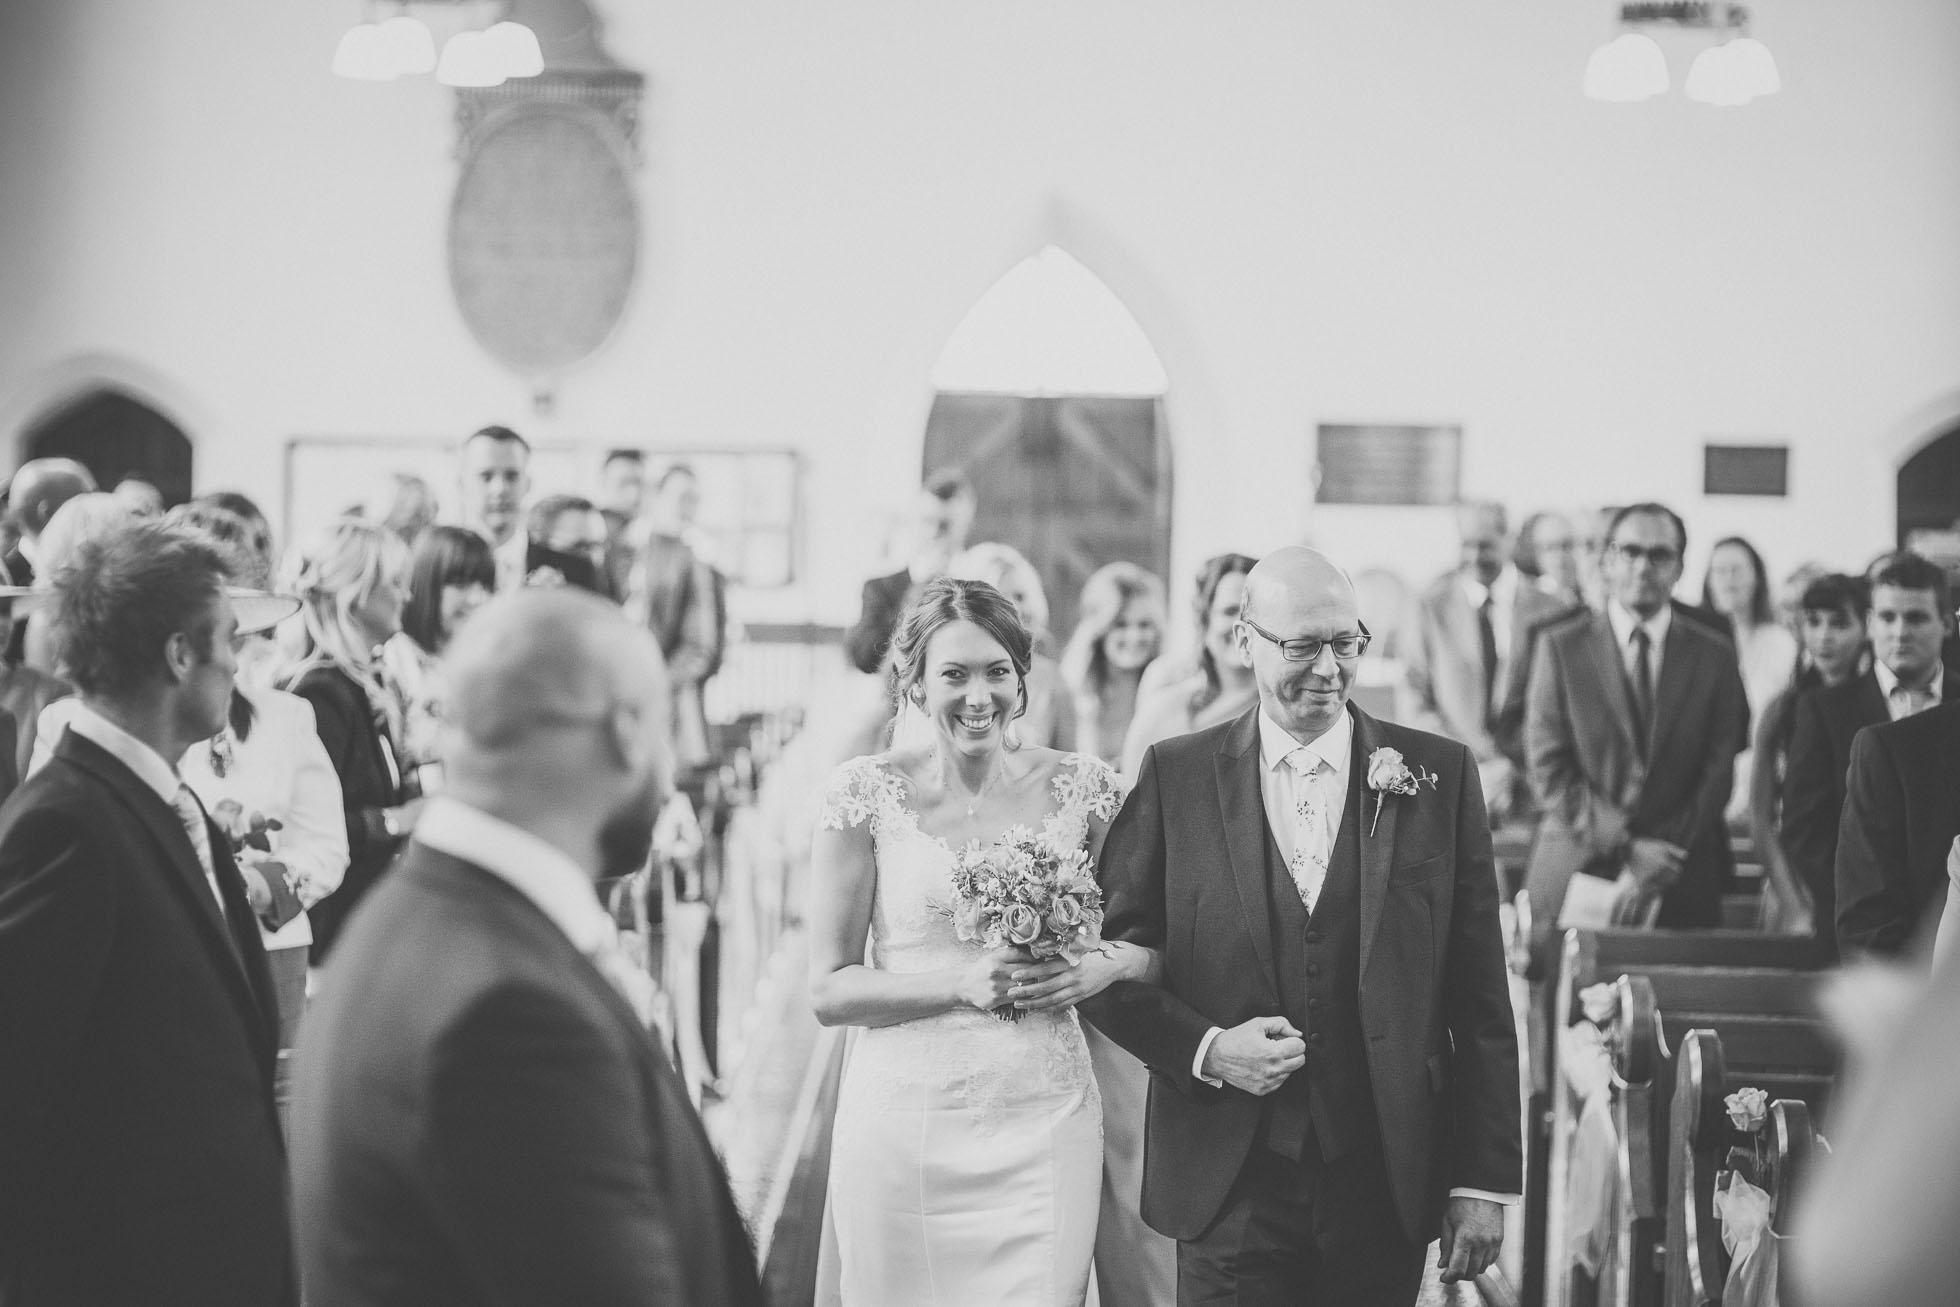 denton-hall-wedding-photographer-28.jpg